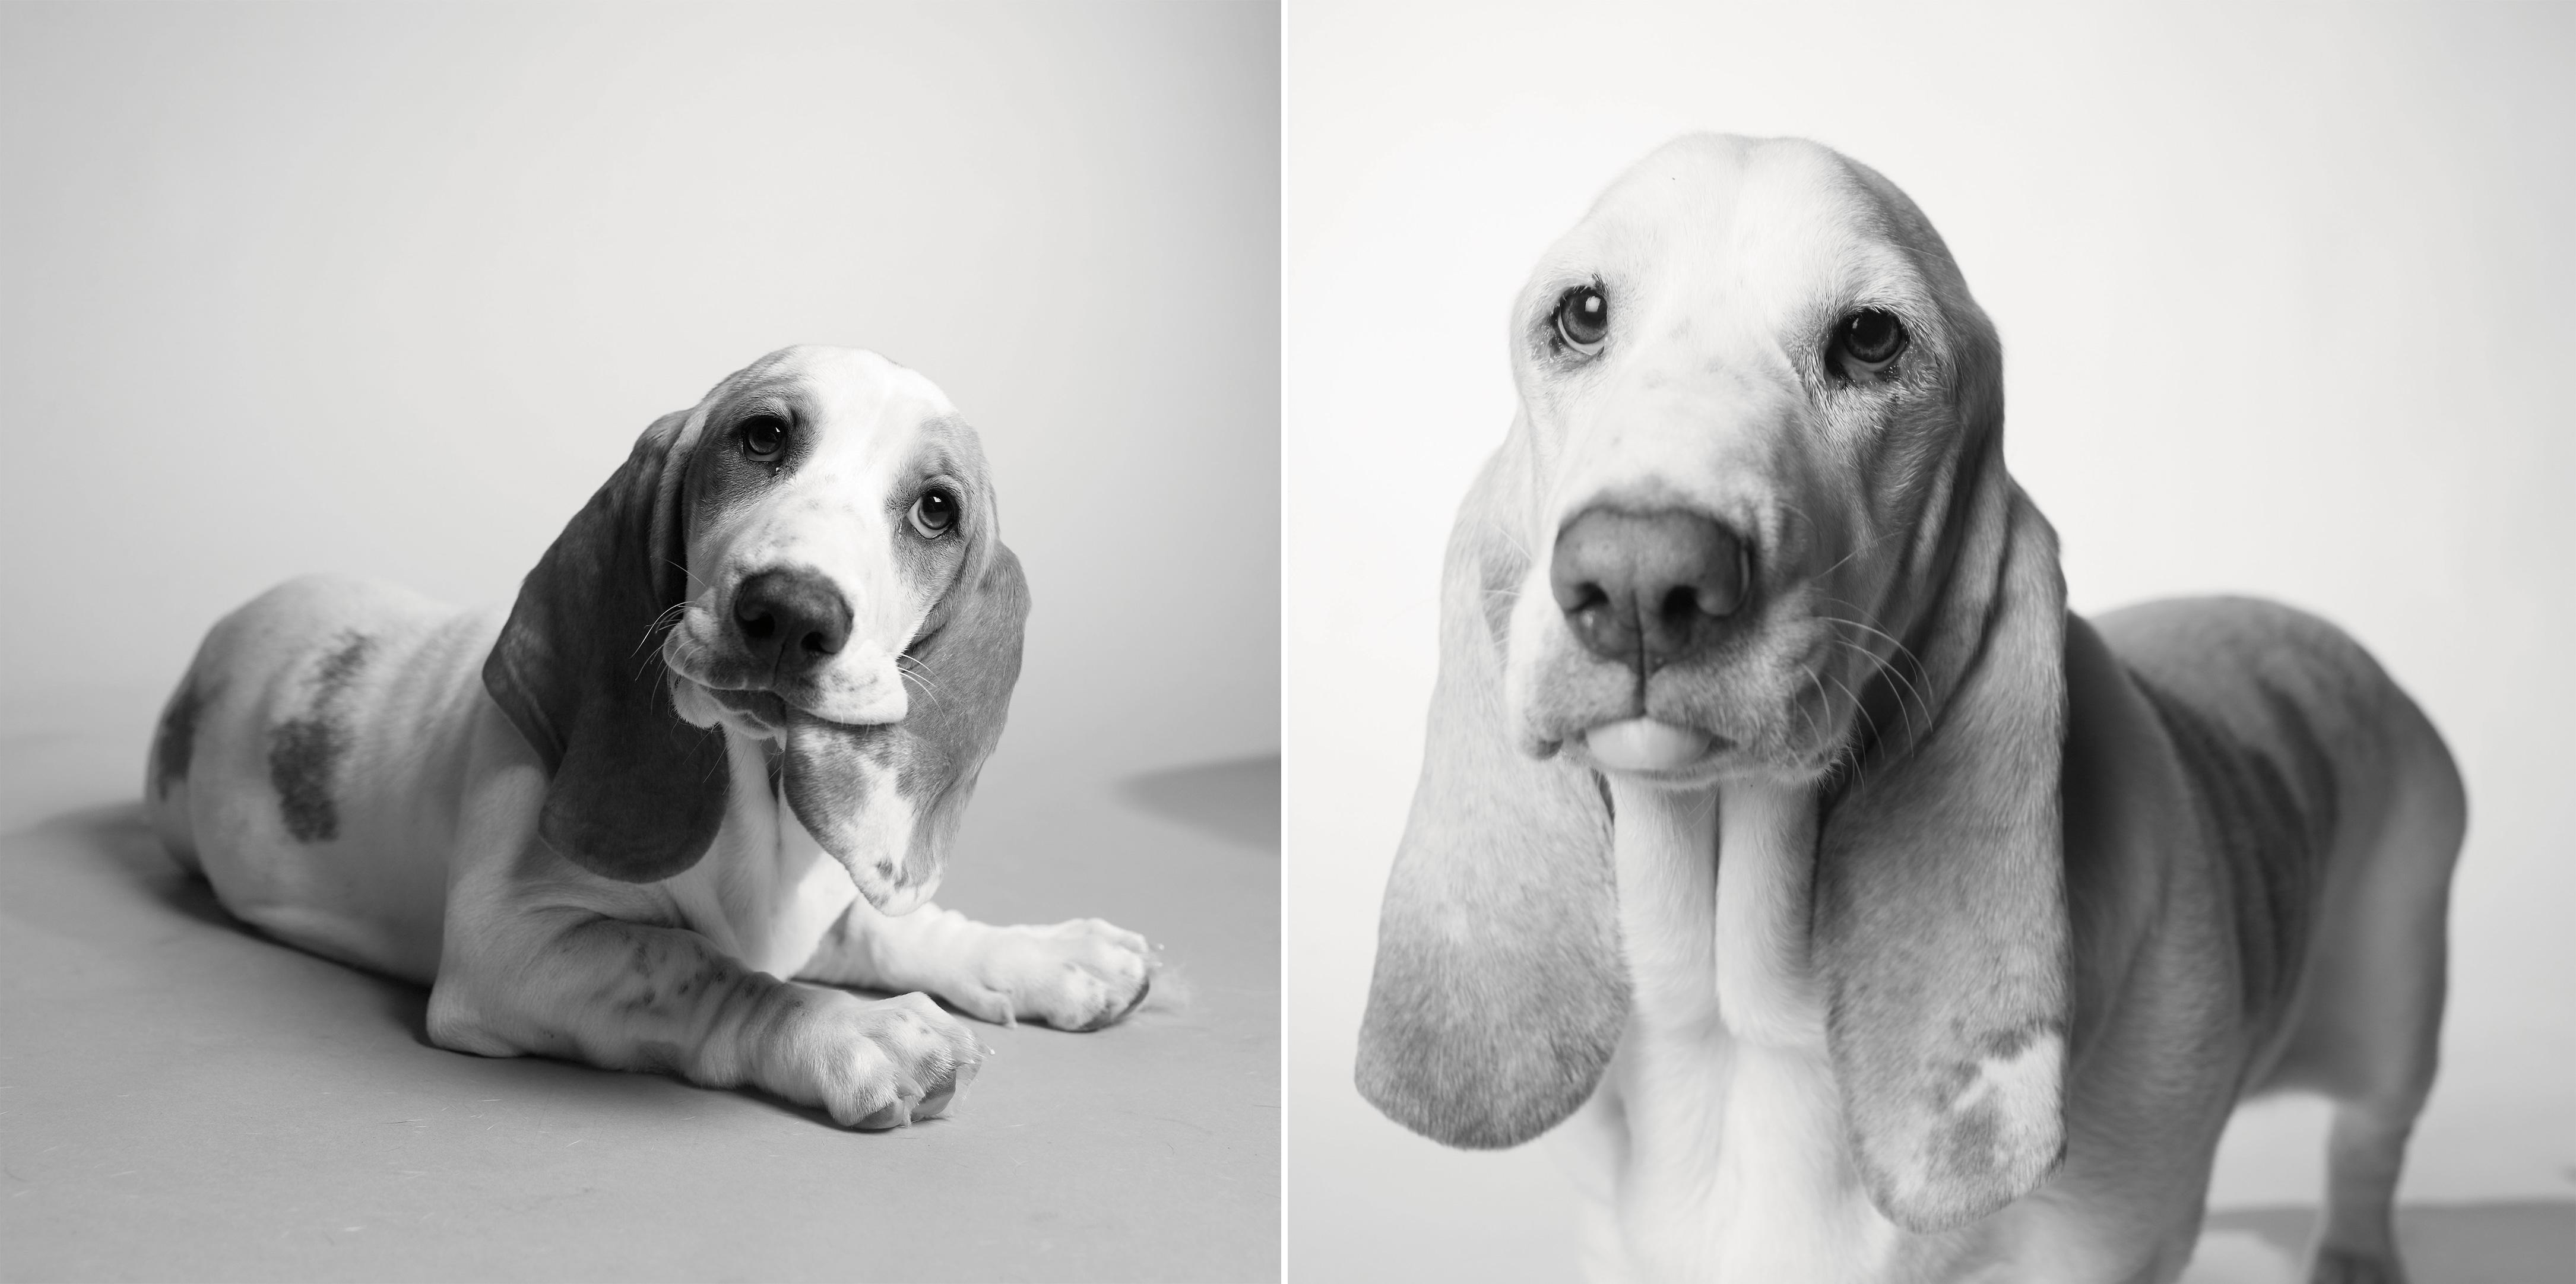 Poppy from Dog Years